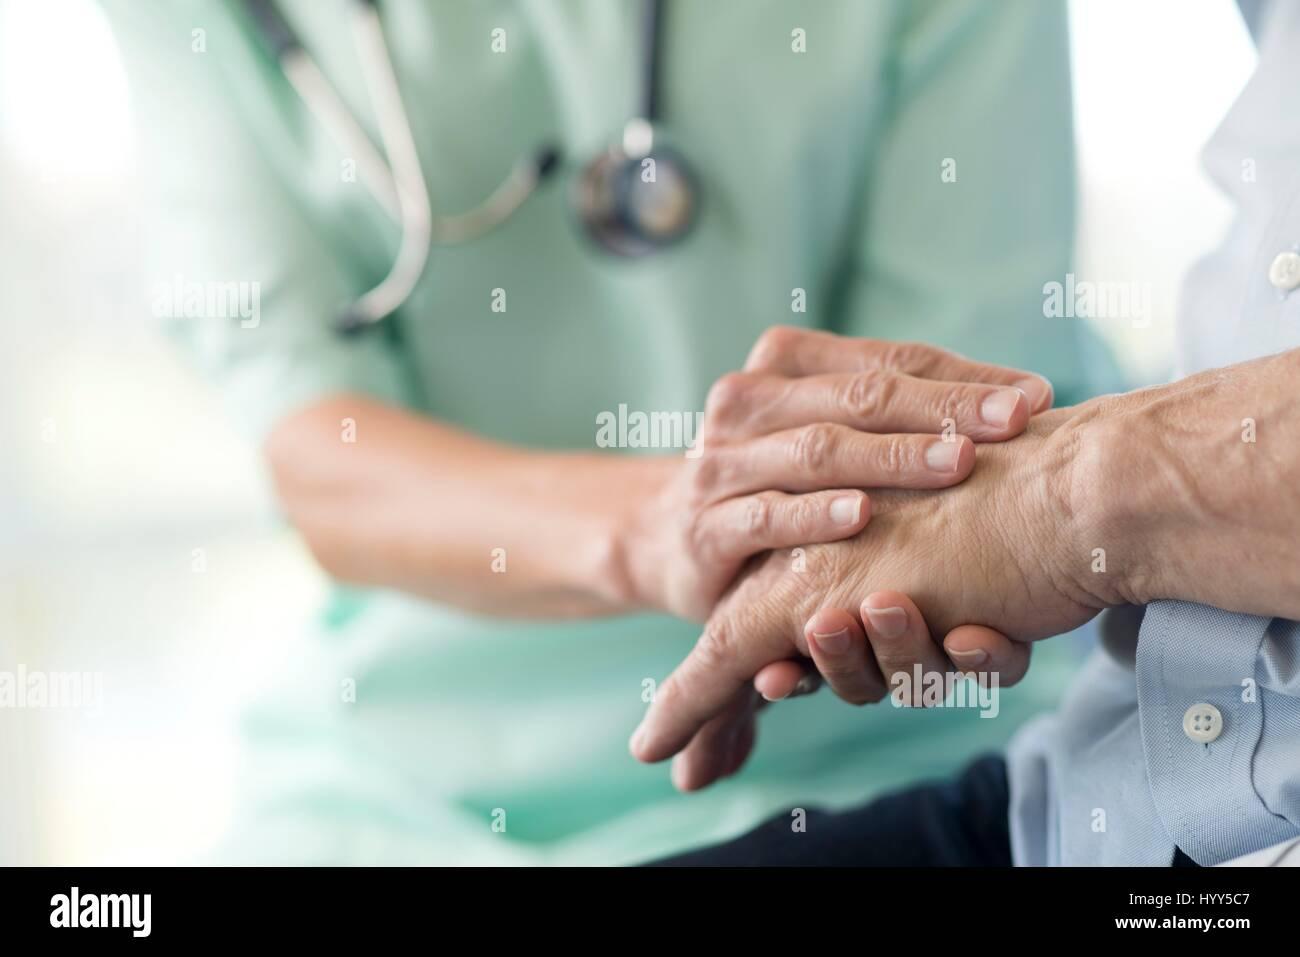 Care worker holding senior man's hand. - Stock Image